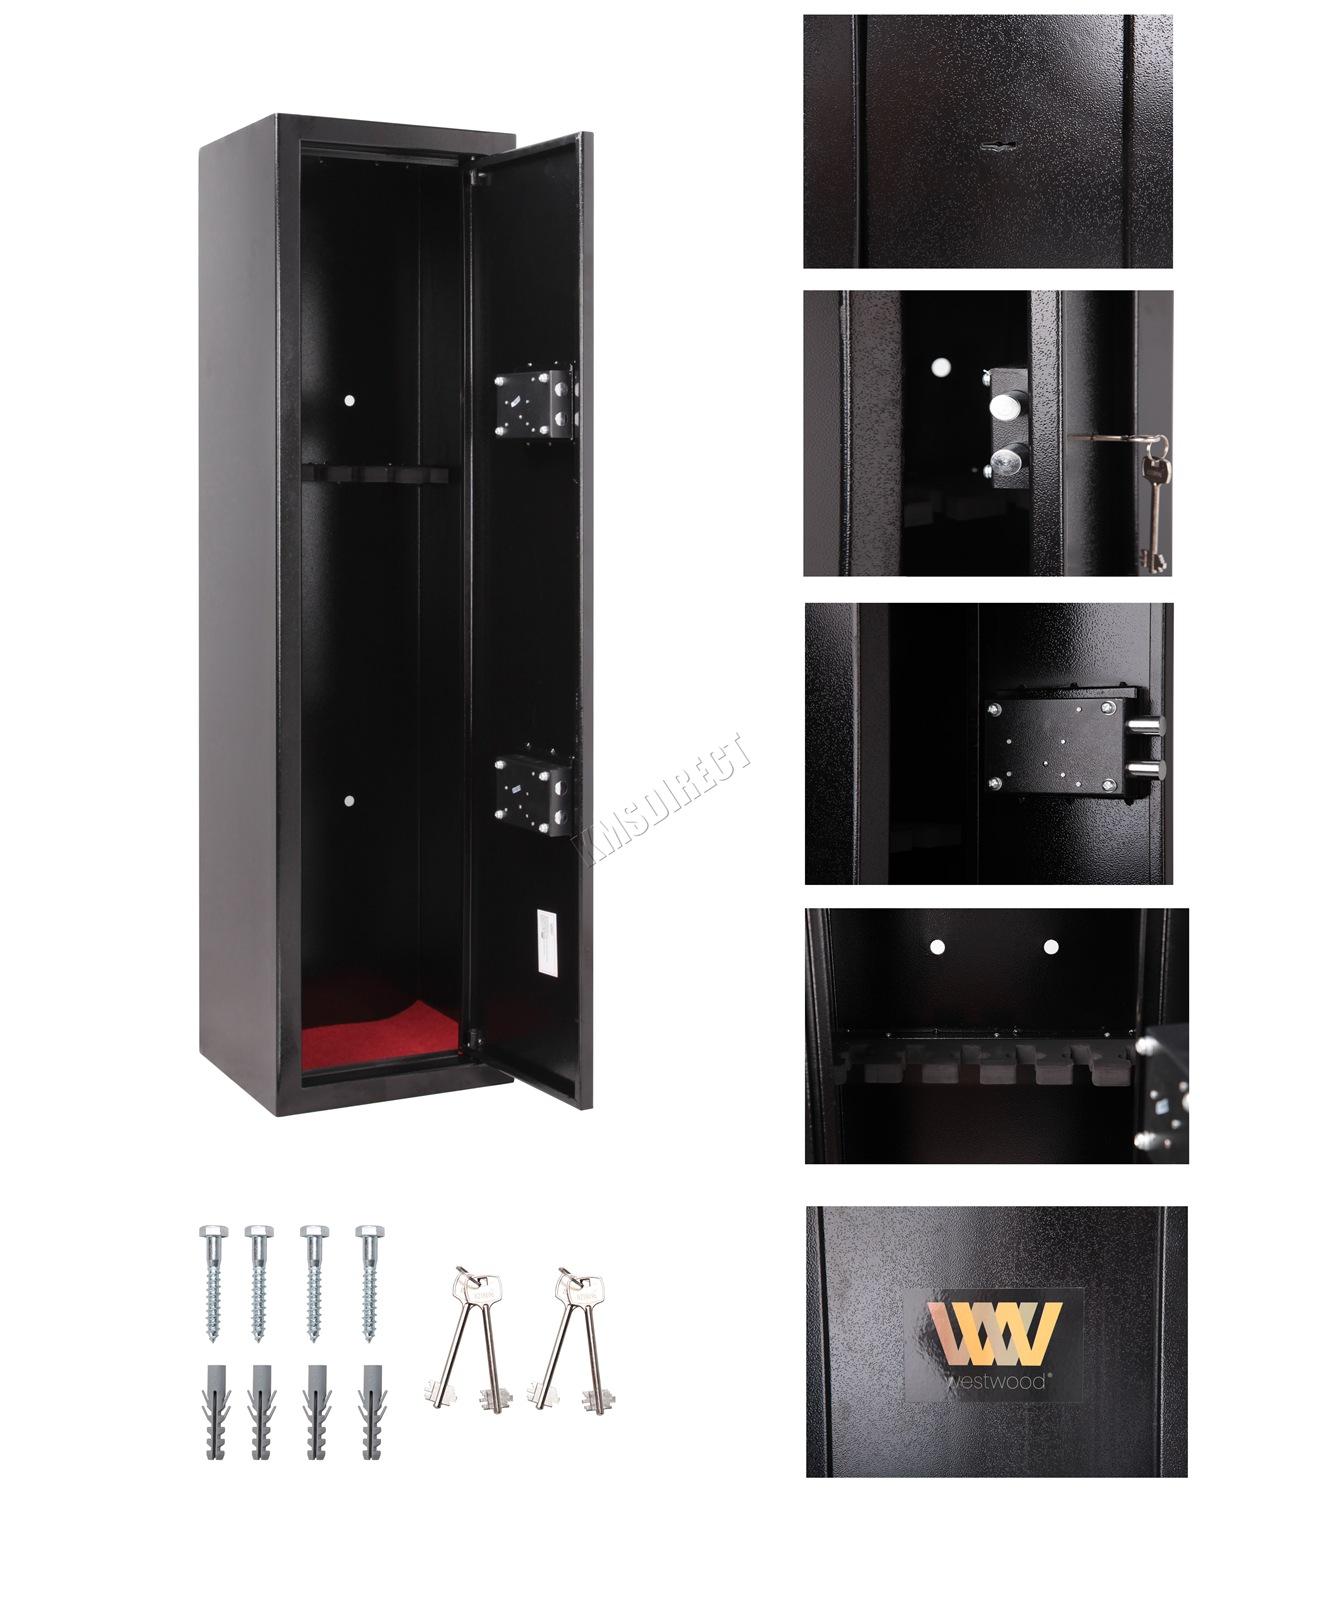 WestWood-3-Or-6-Gun-Cabinet-Security-Lockable-  sc 1 st  eBay & WestWood 3 Or 6 Gun Cabinet Security Lockable Safe Storage Rifle ...